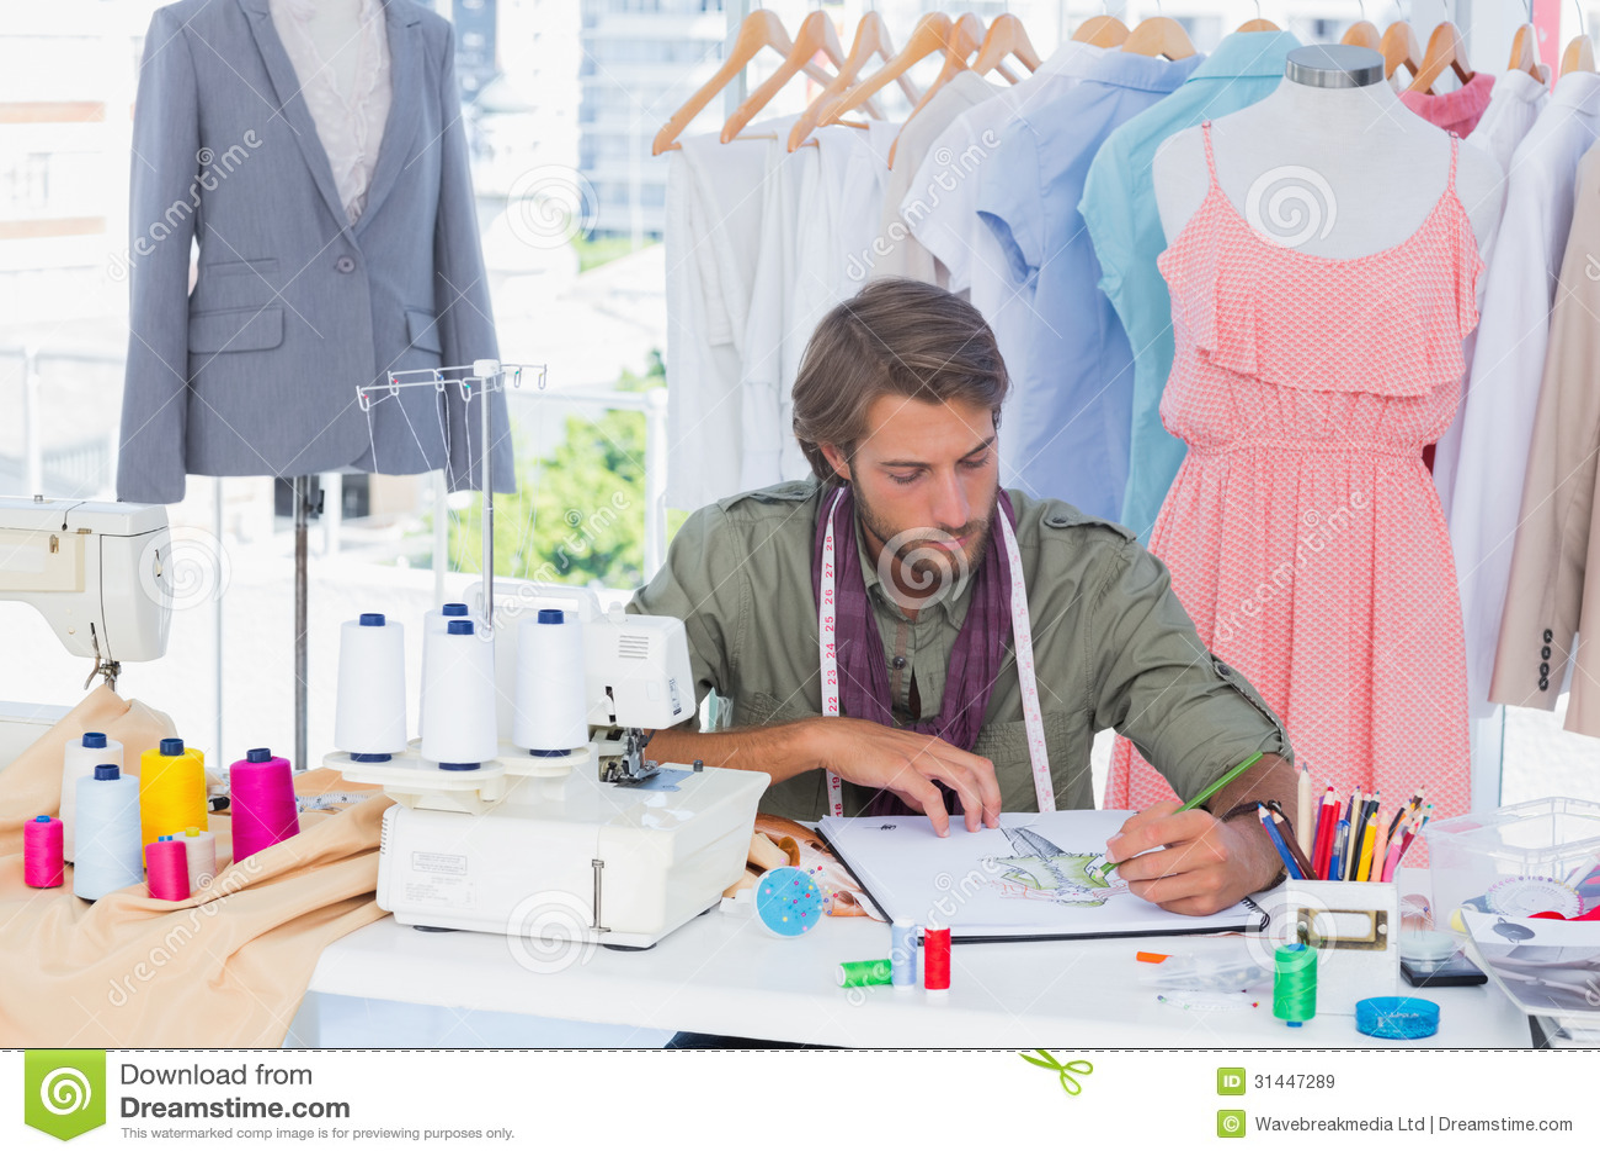 Clothes designer online